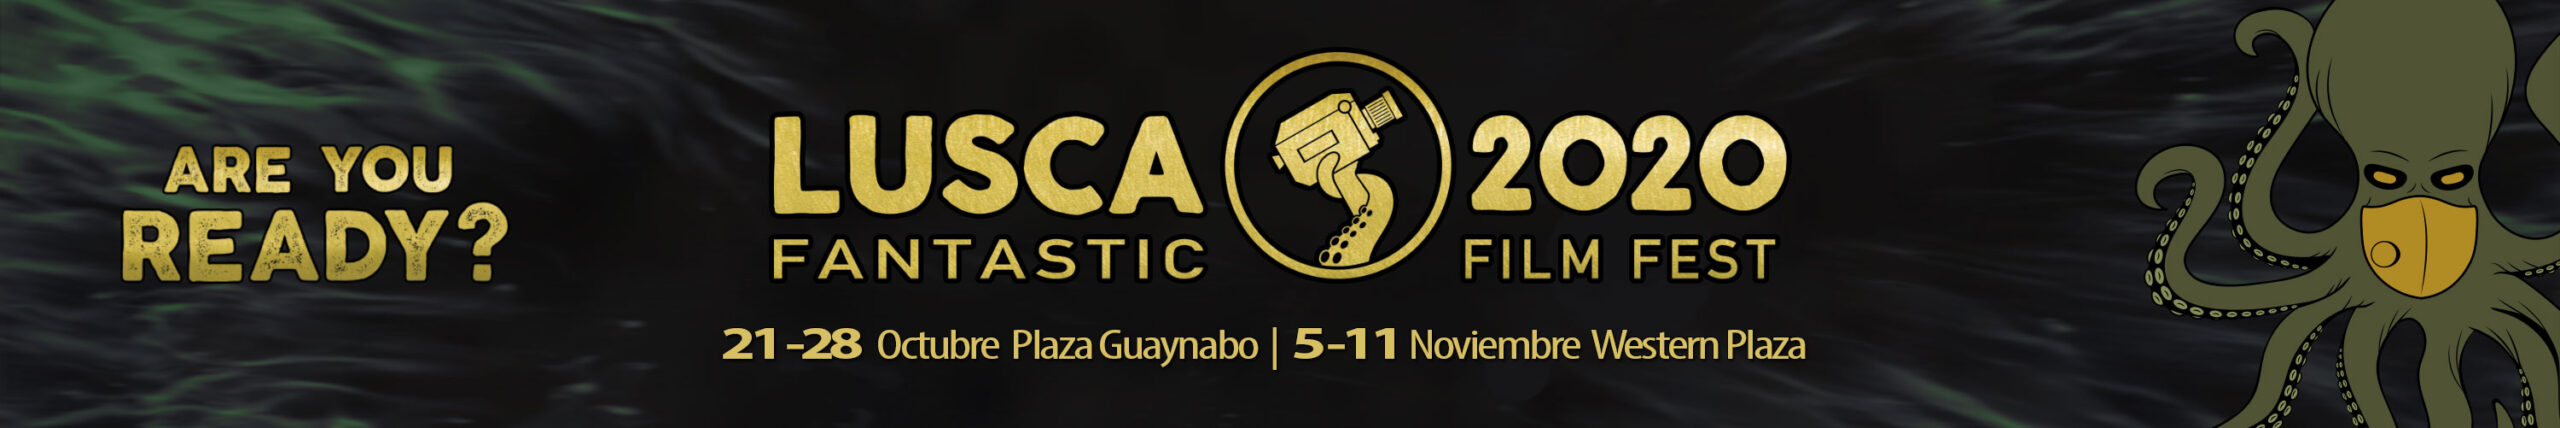 banner-programa-LUSCA-2020